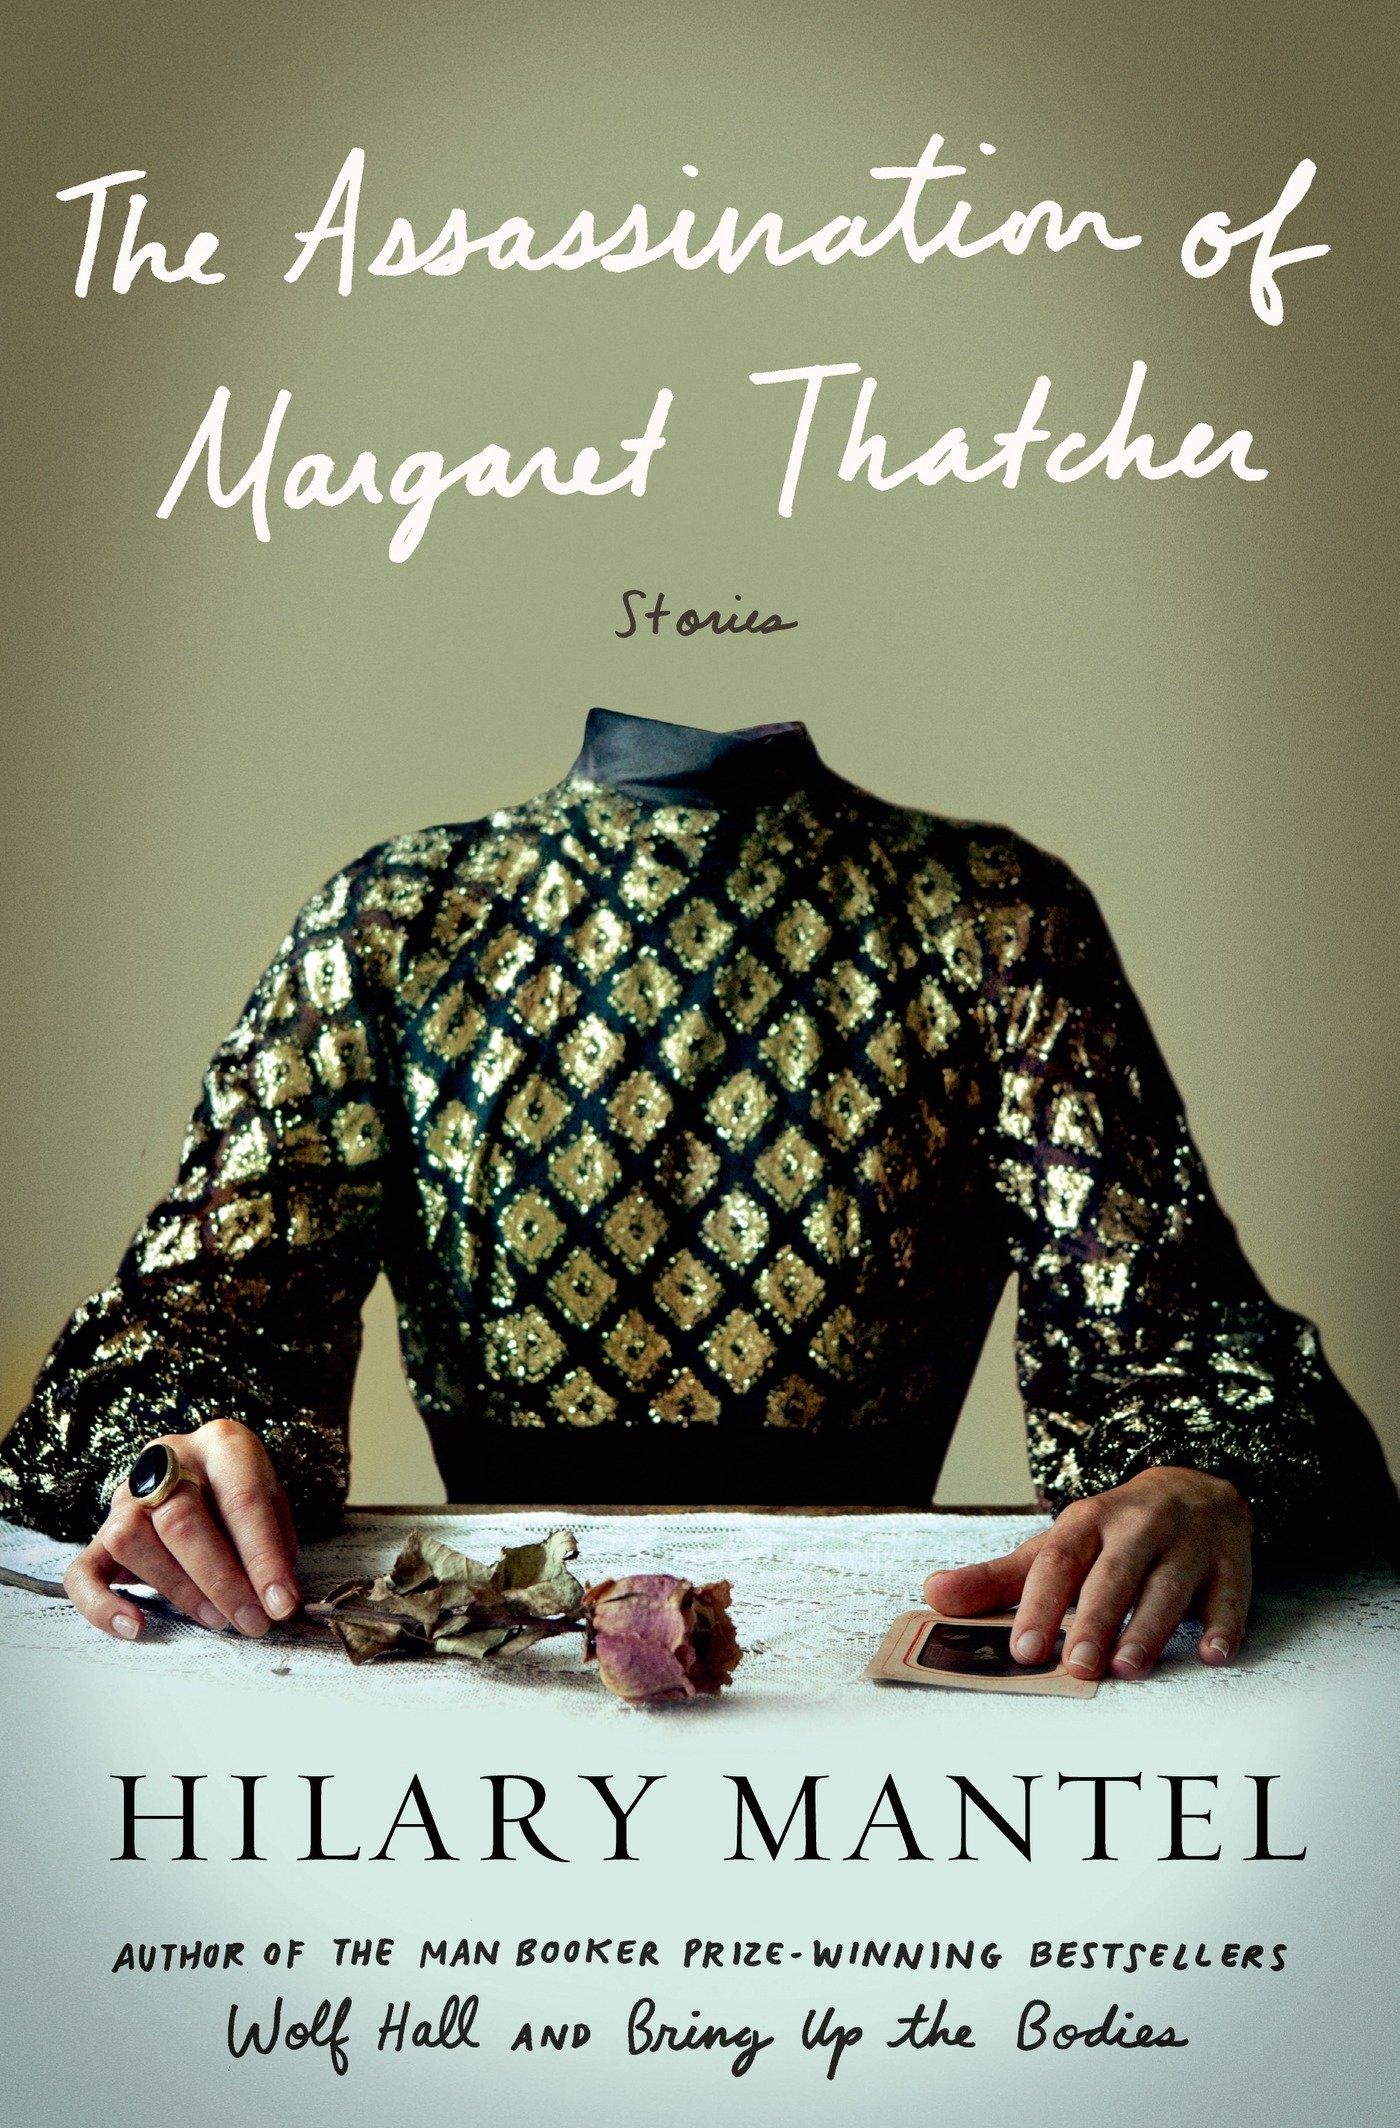 the assassination of margaret thatcher stories hilary mantel 9781627792103 amazoncom books